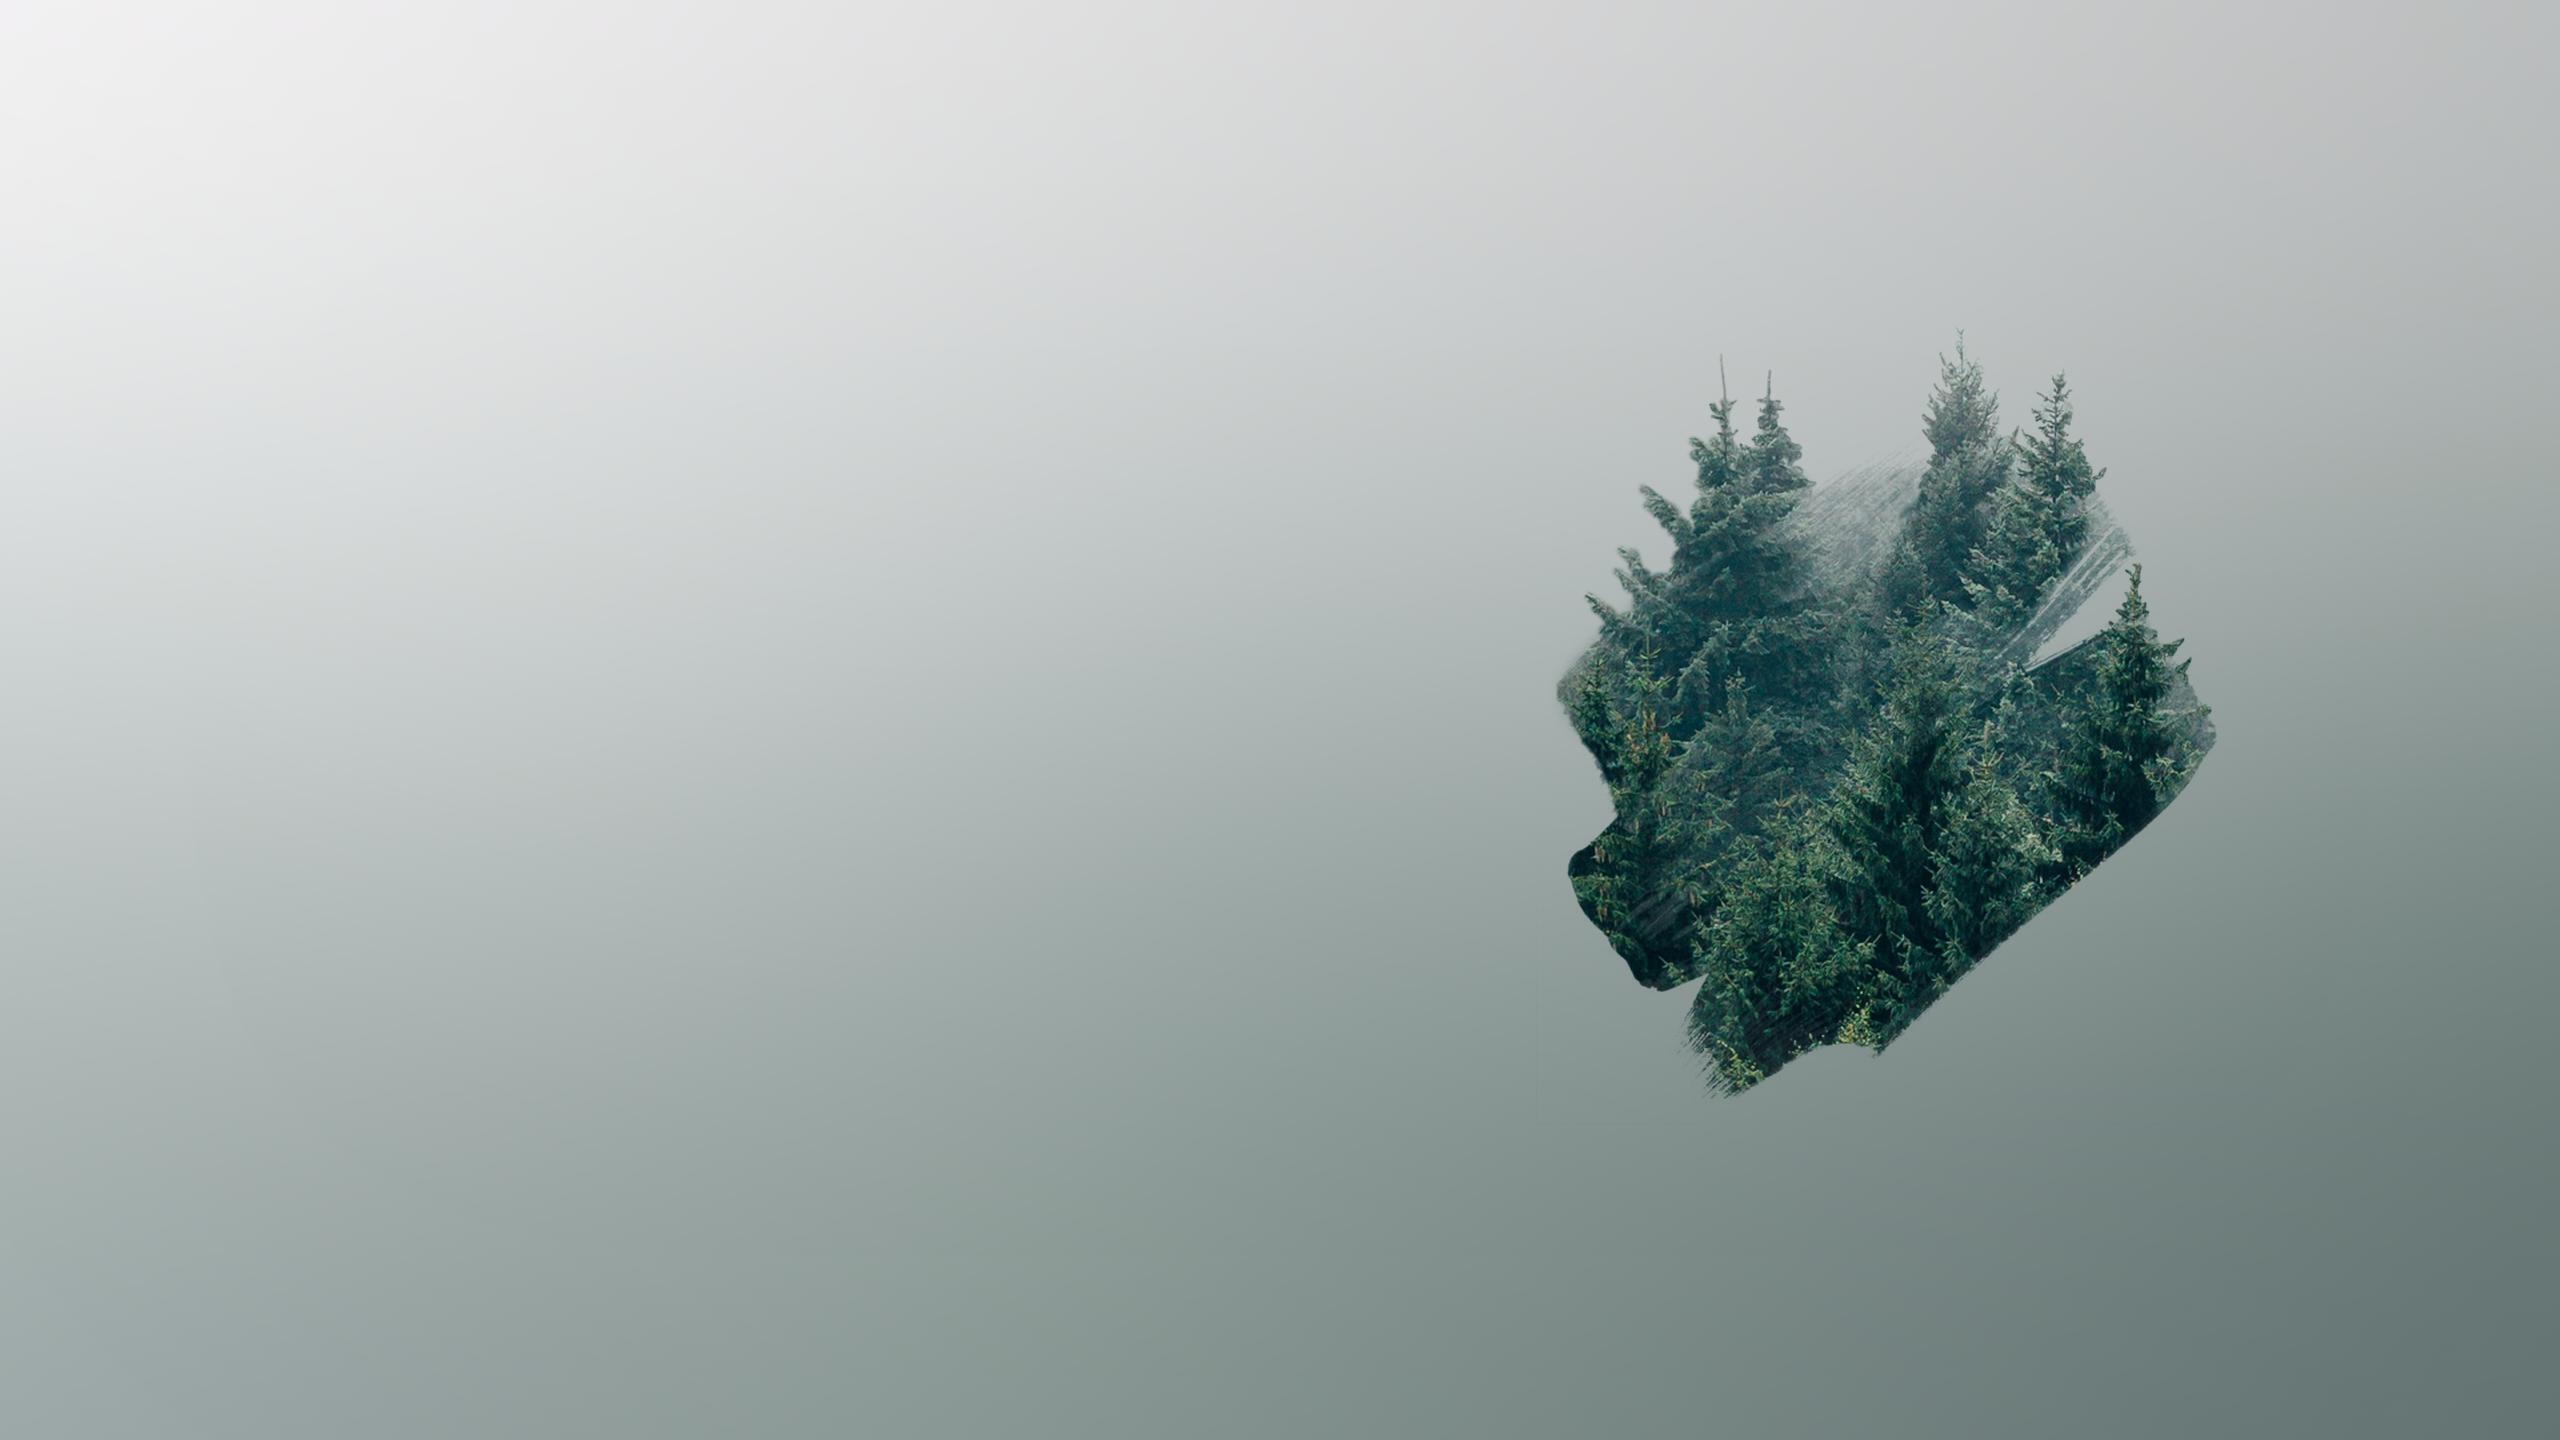 Minimalist Forest 2560x1440 Desktop Background Images Forest Hd Wallpaper